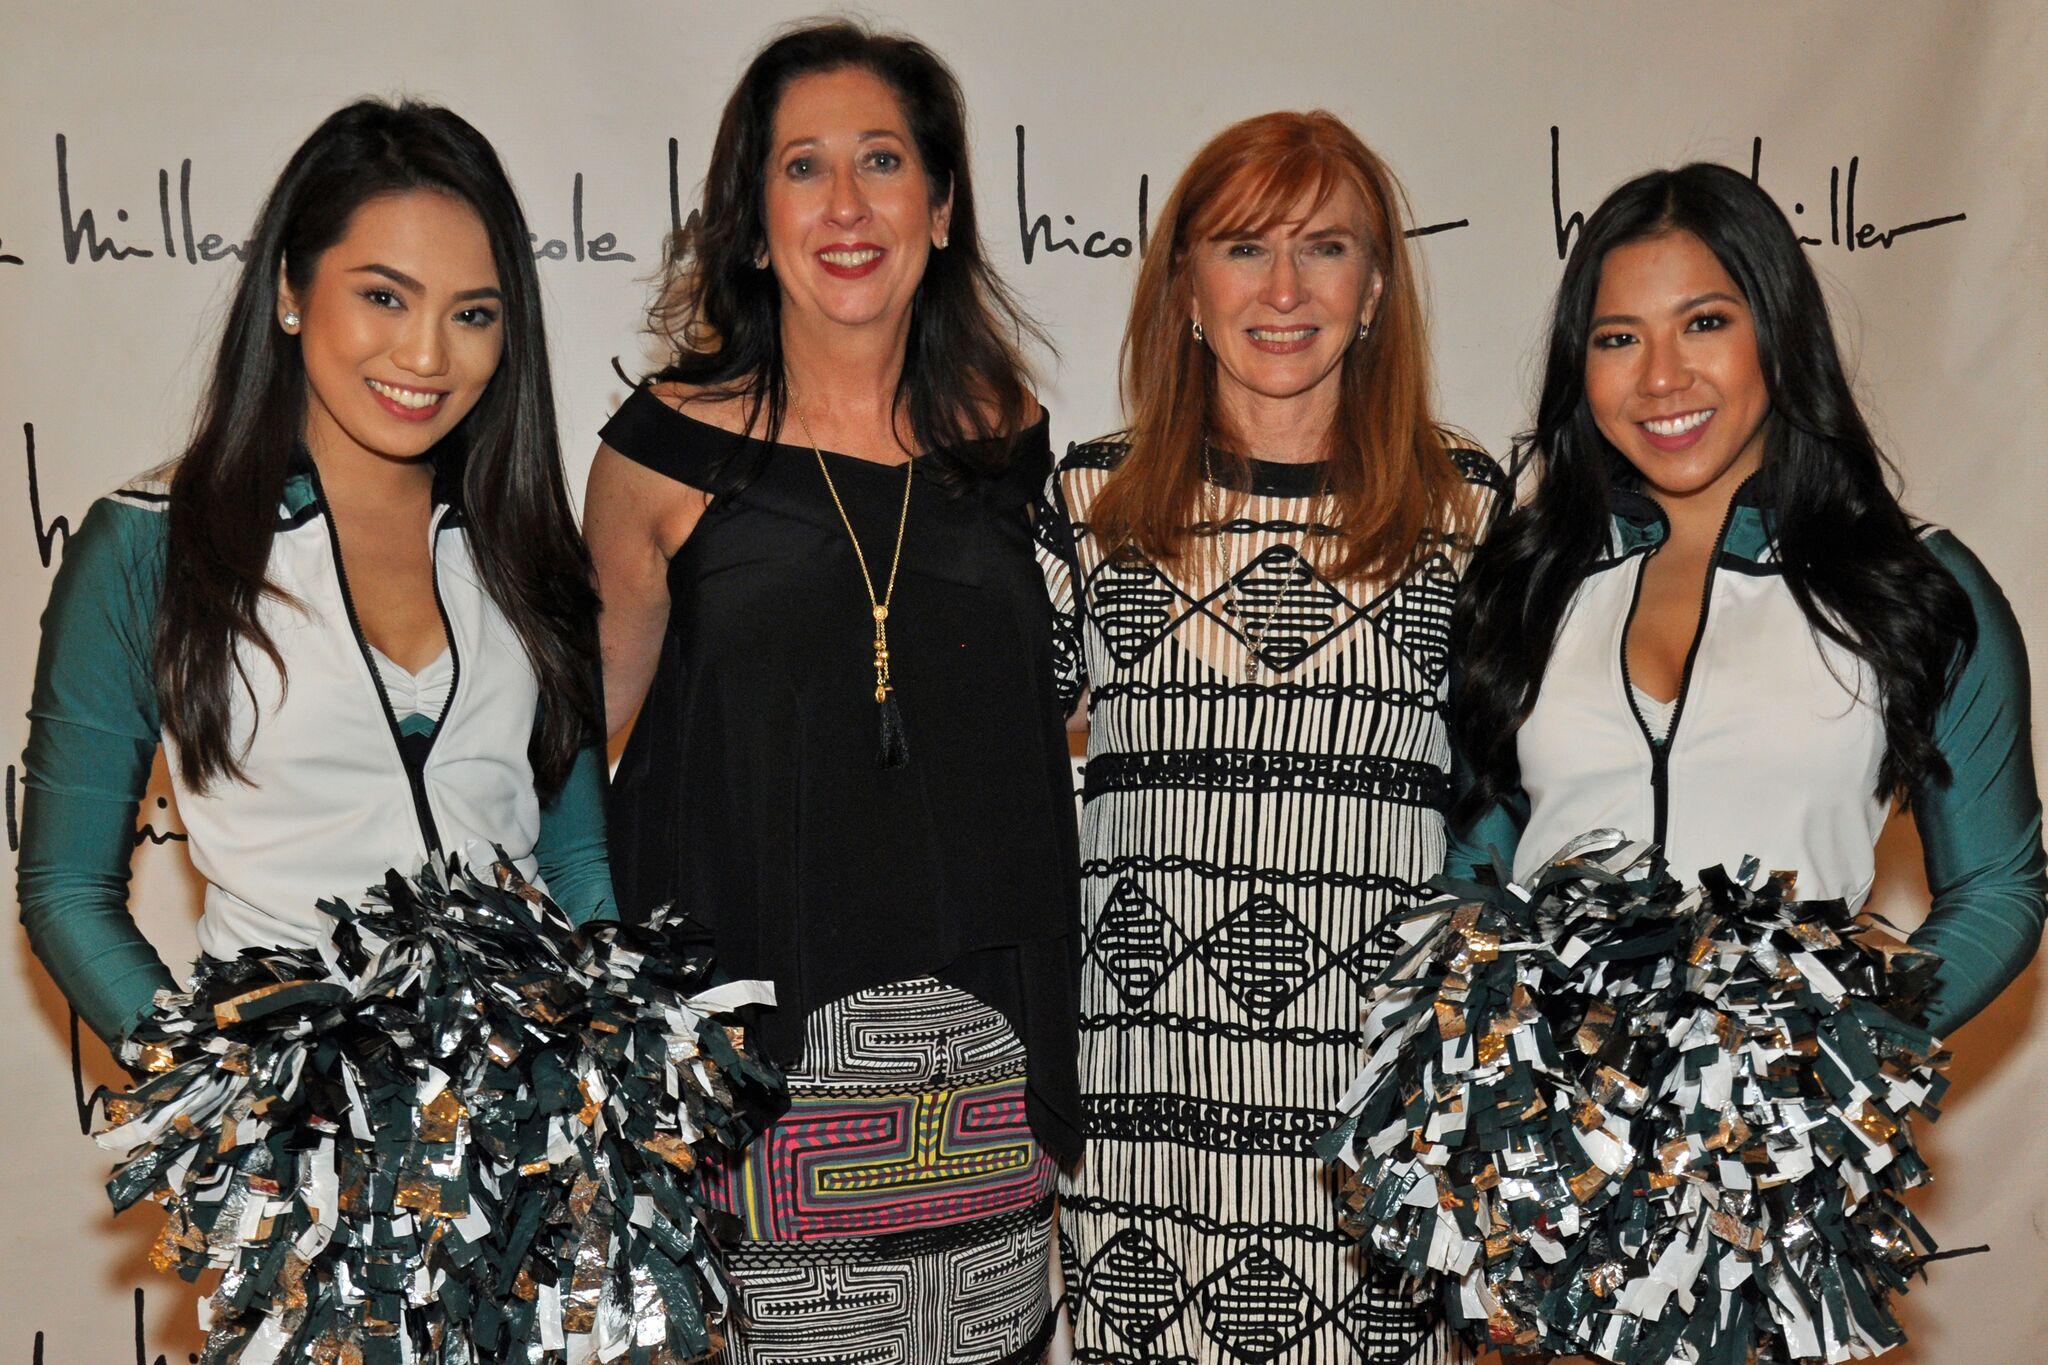 Nicole Miller and Eagles Cheerleaders